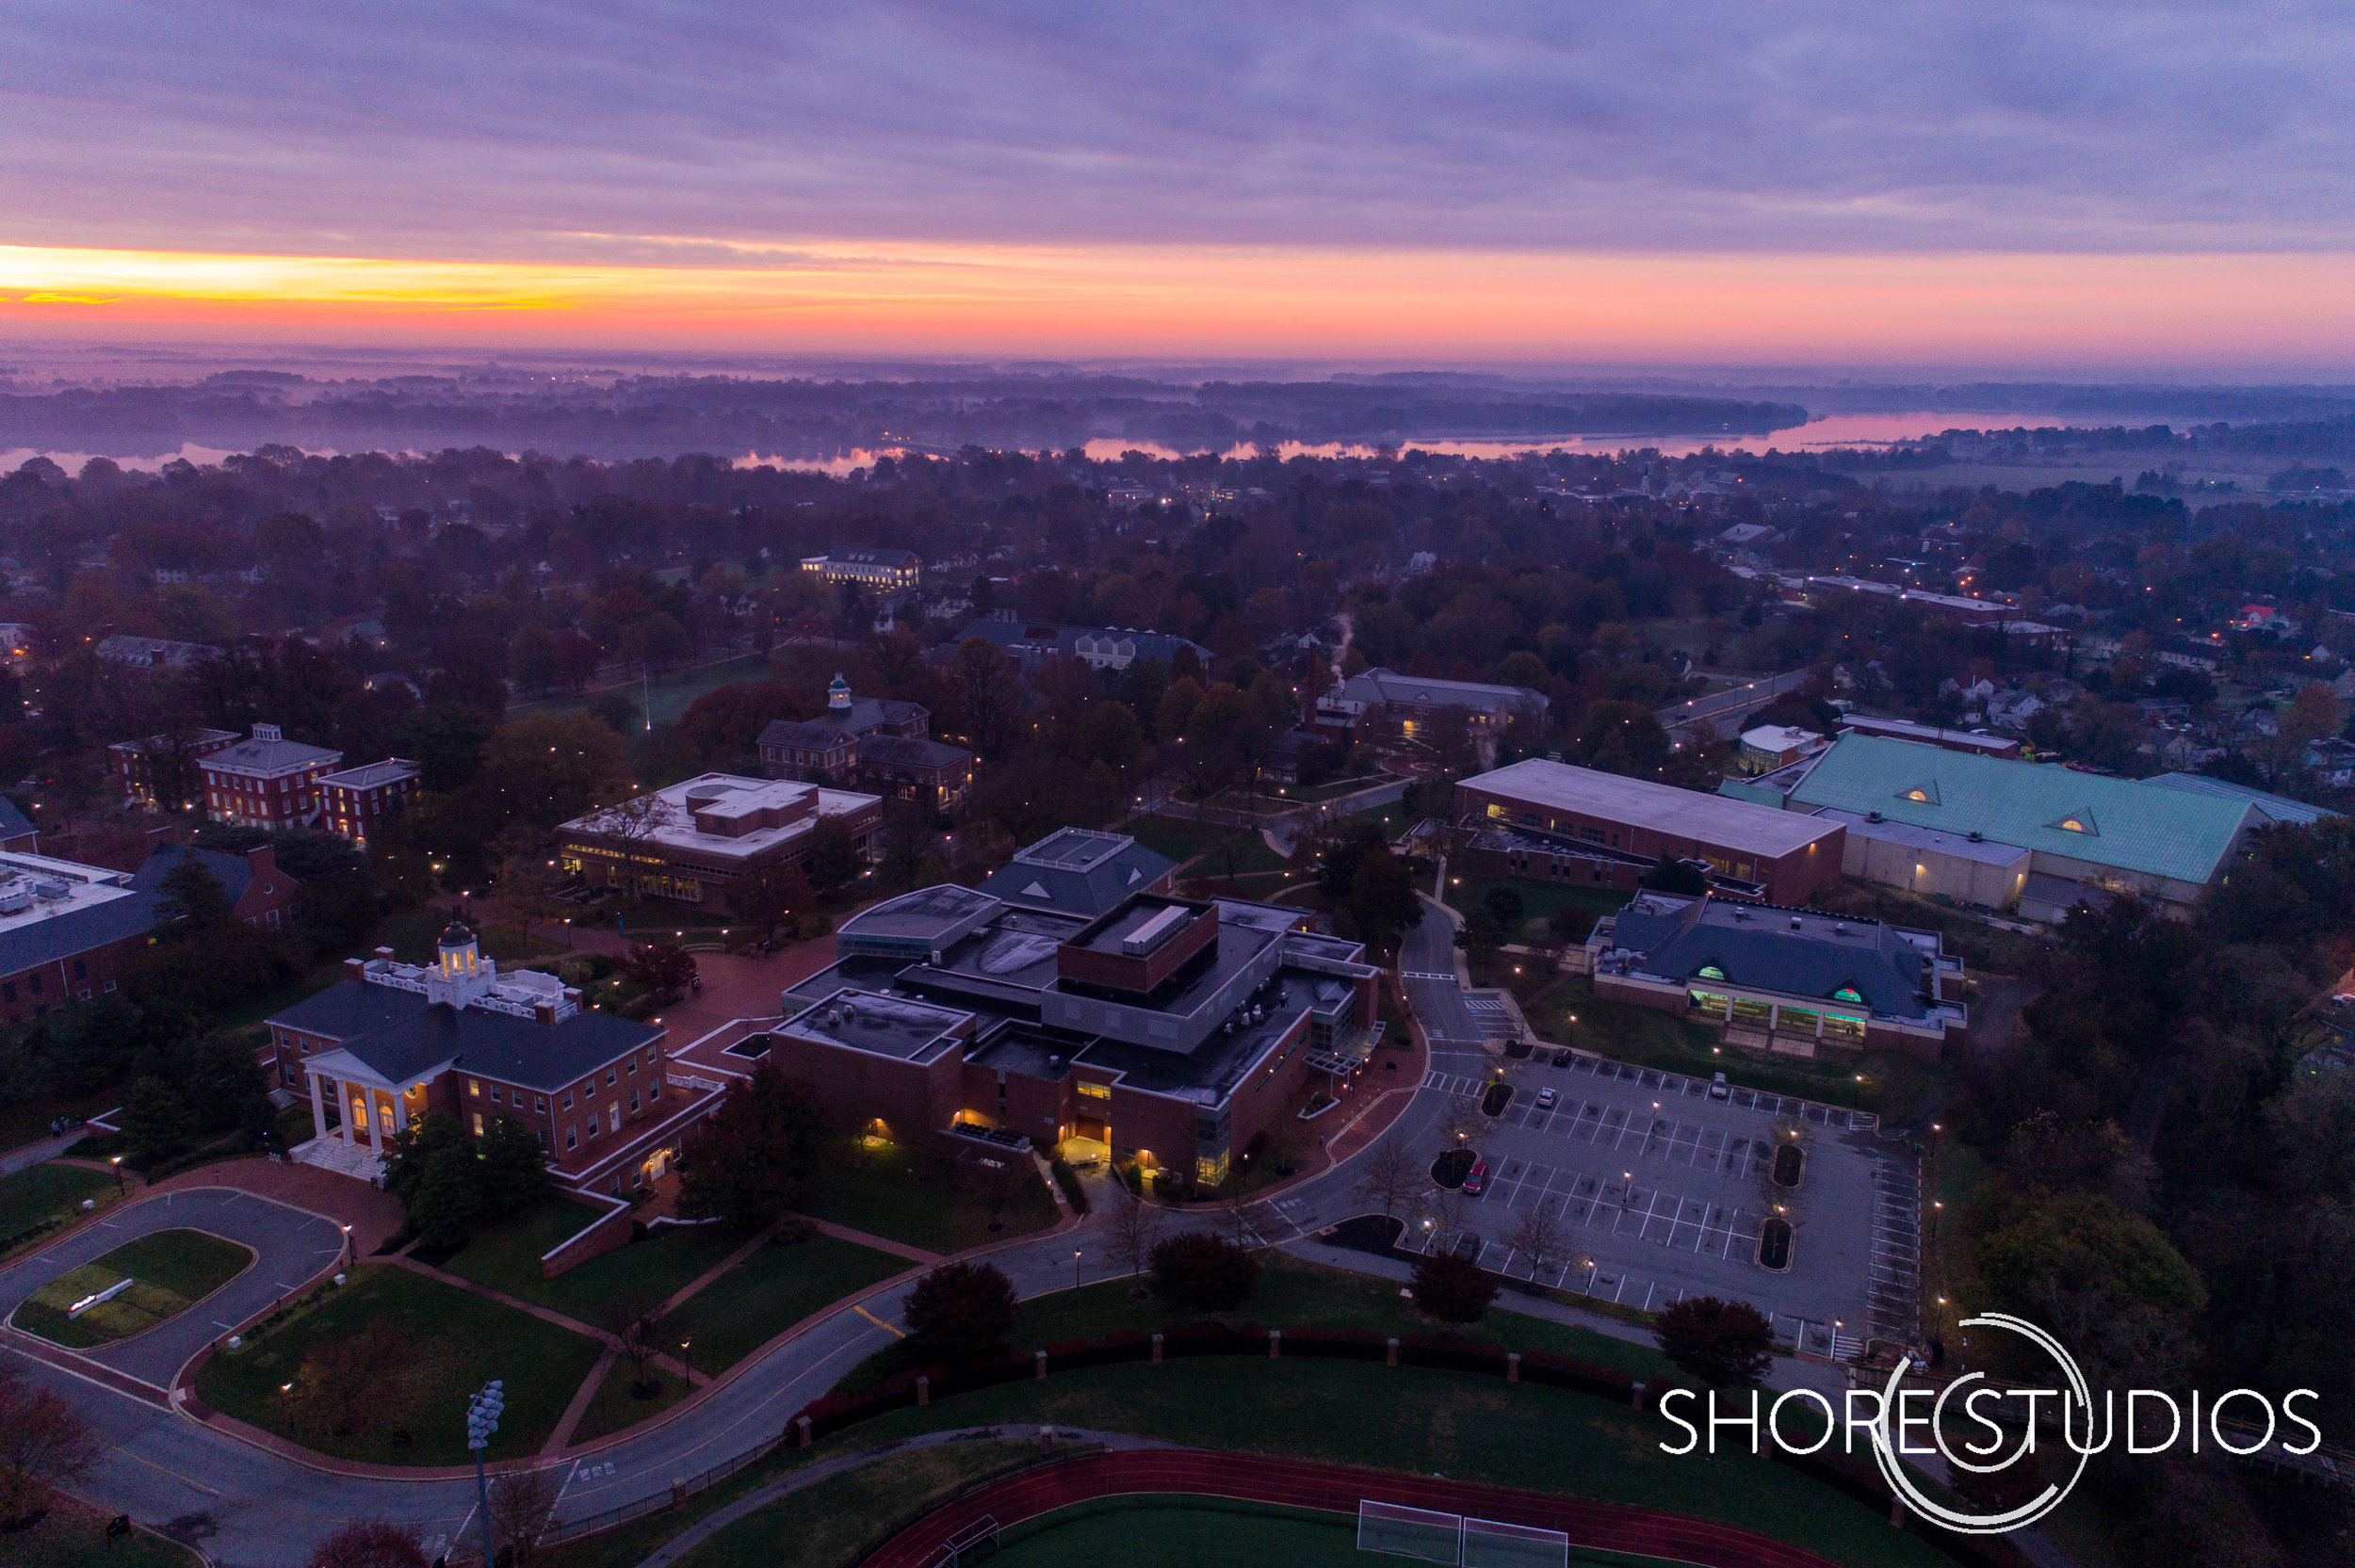 Washington College Dawn_3.jpg